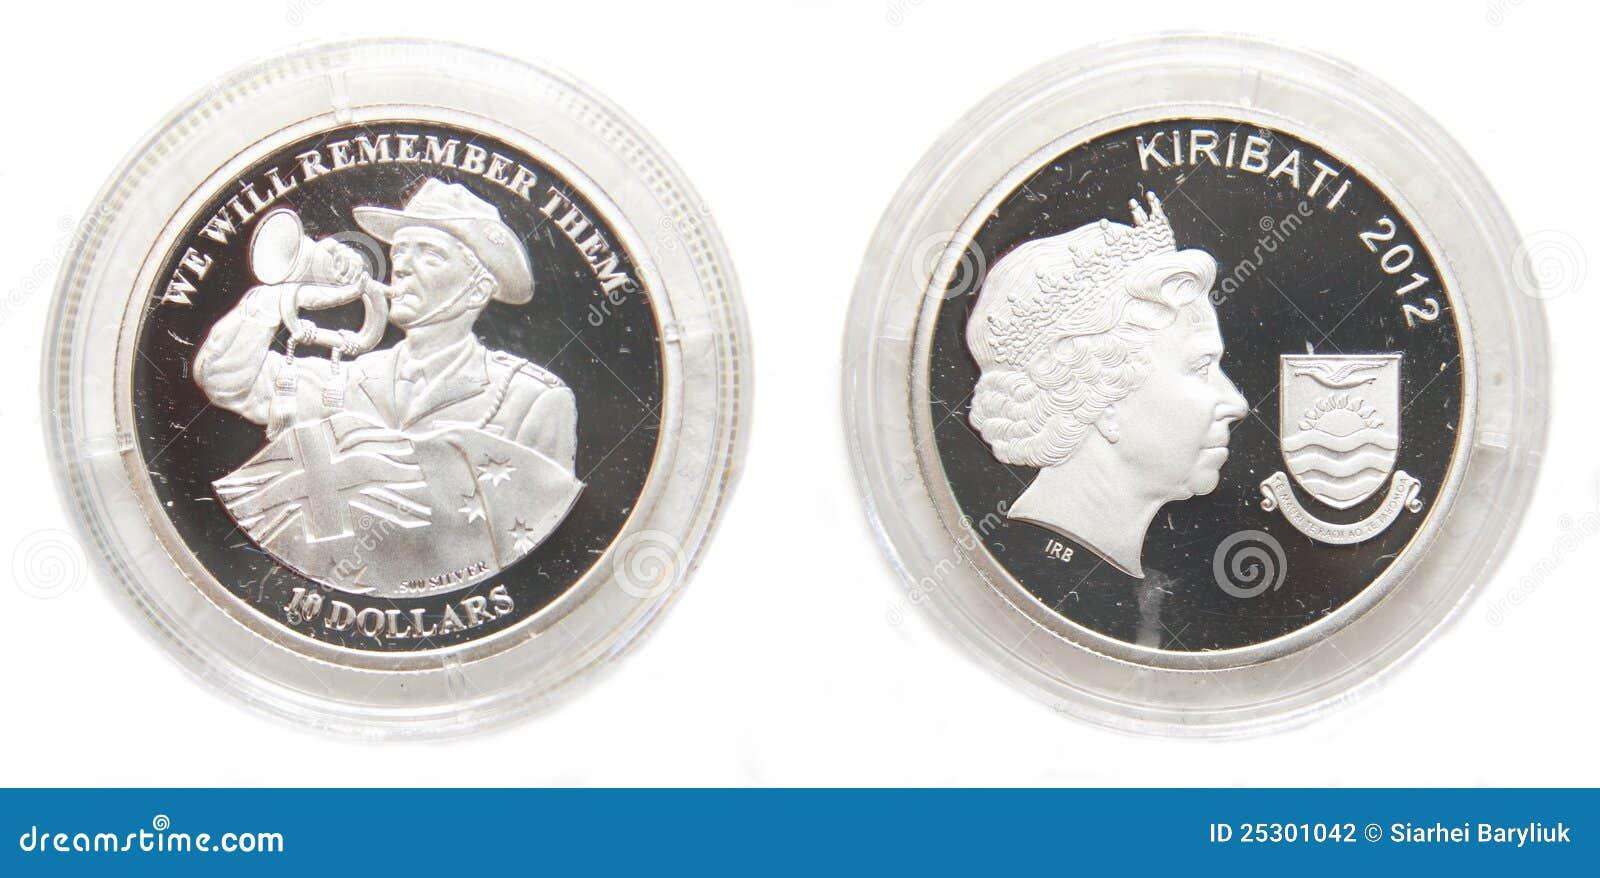 Australien Und Kiribati 10 Dollar Silbermünze Stockfoto Bild Von